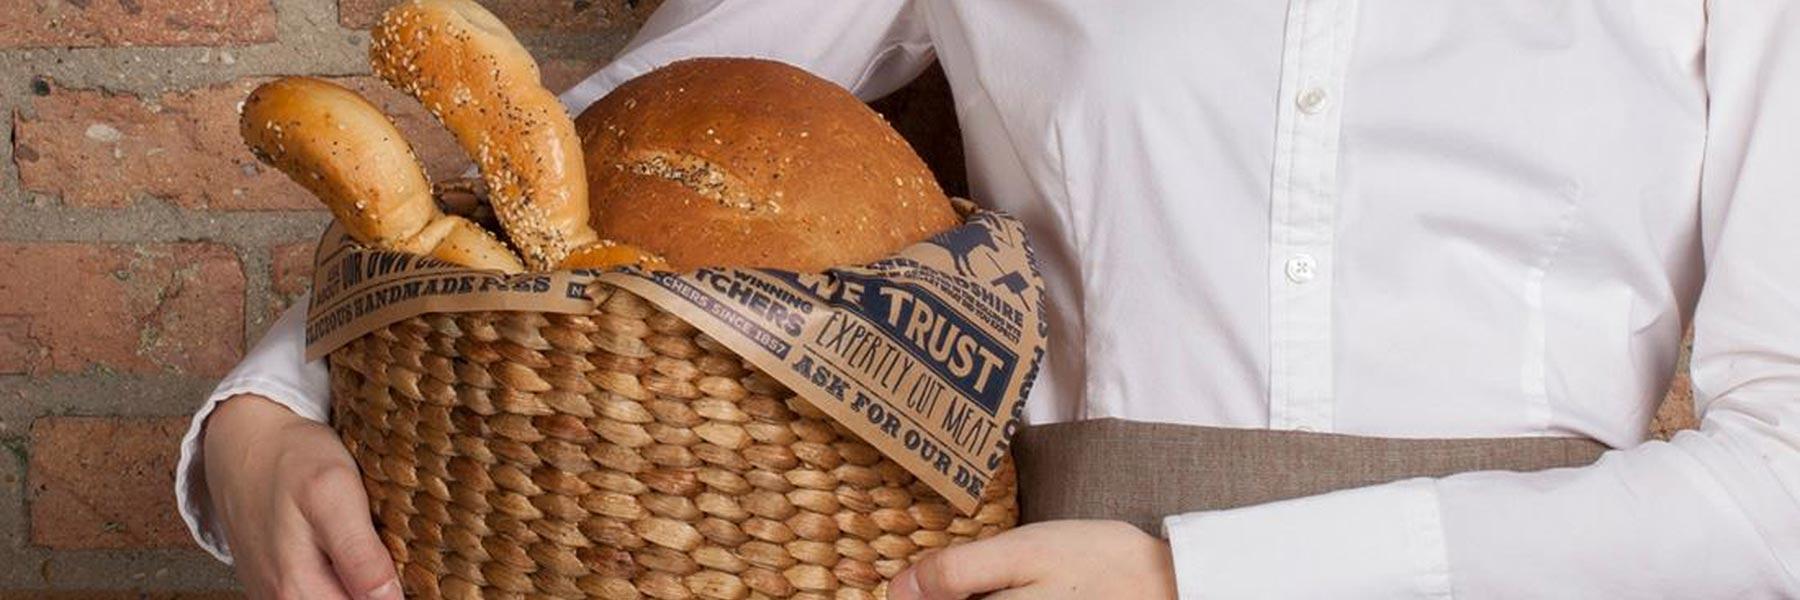 Bespoke Textiles restaurant bread basket